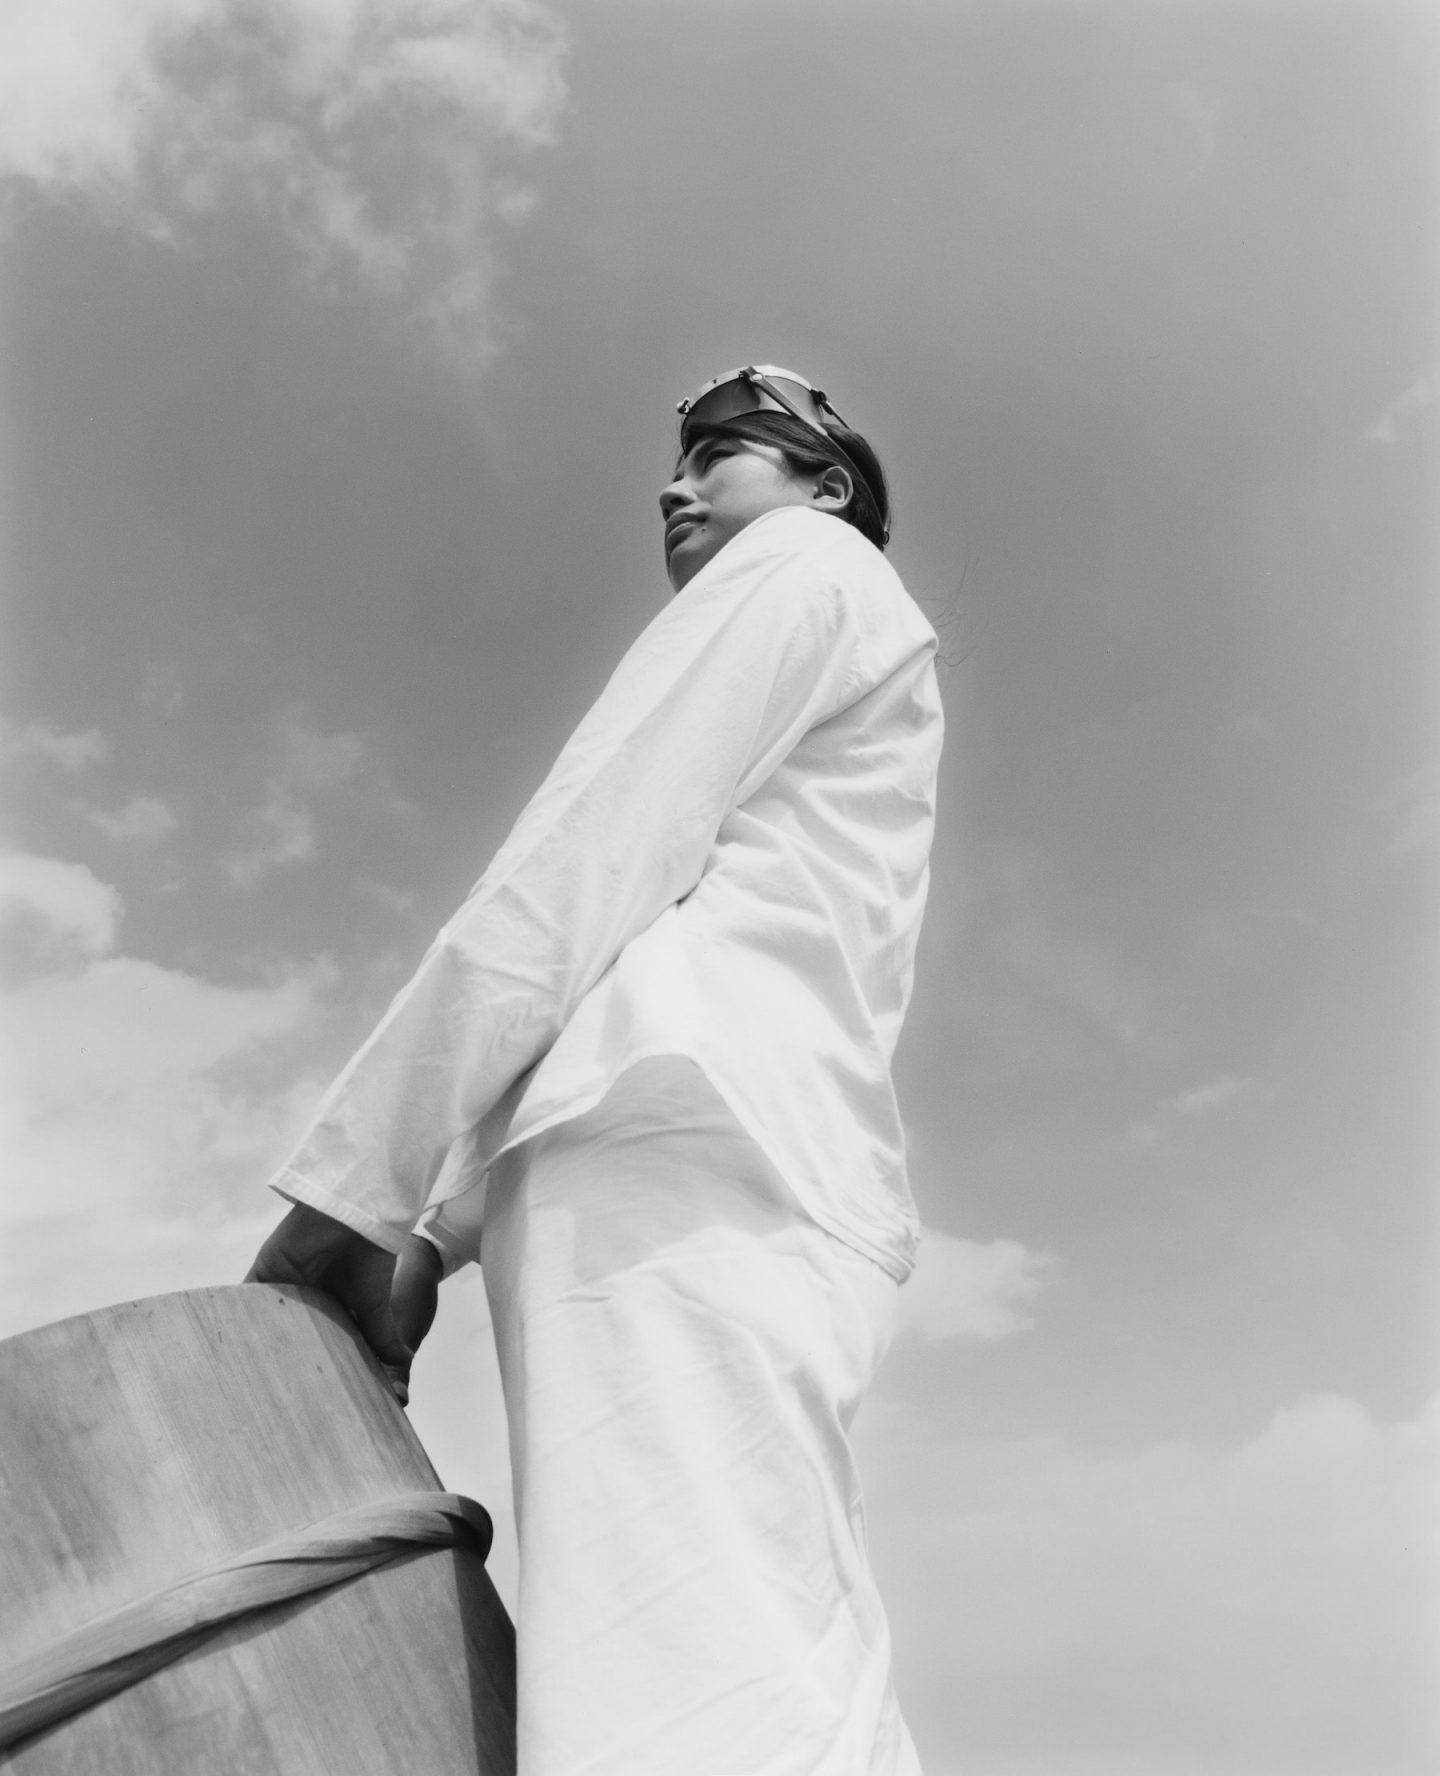 IGNANT-Photography-Stefan-Dotter-Sea-Women-Japan-04